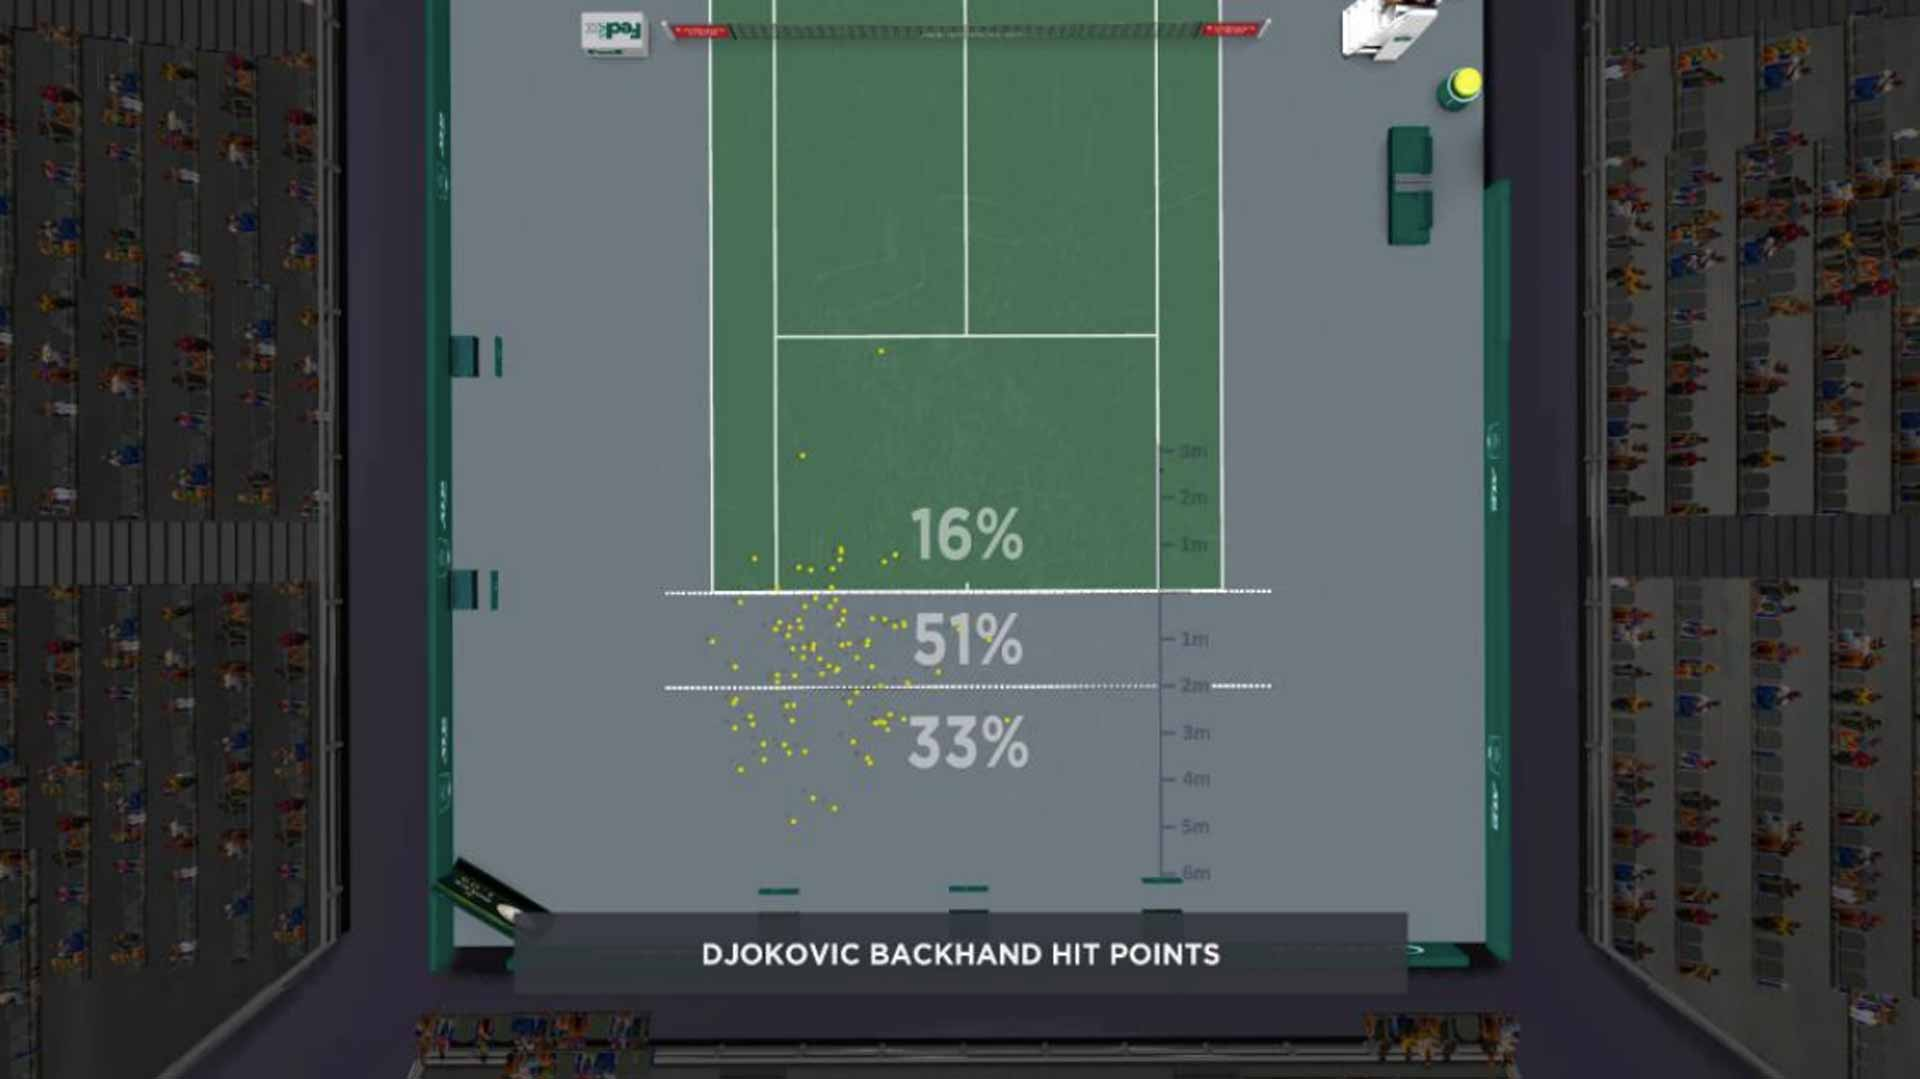 Djokovic Backhand Hit Point